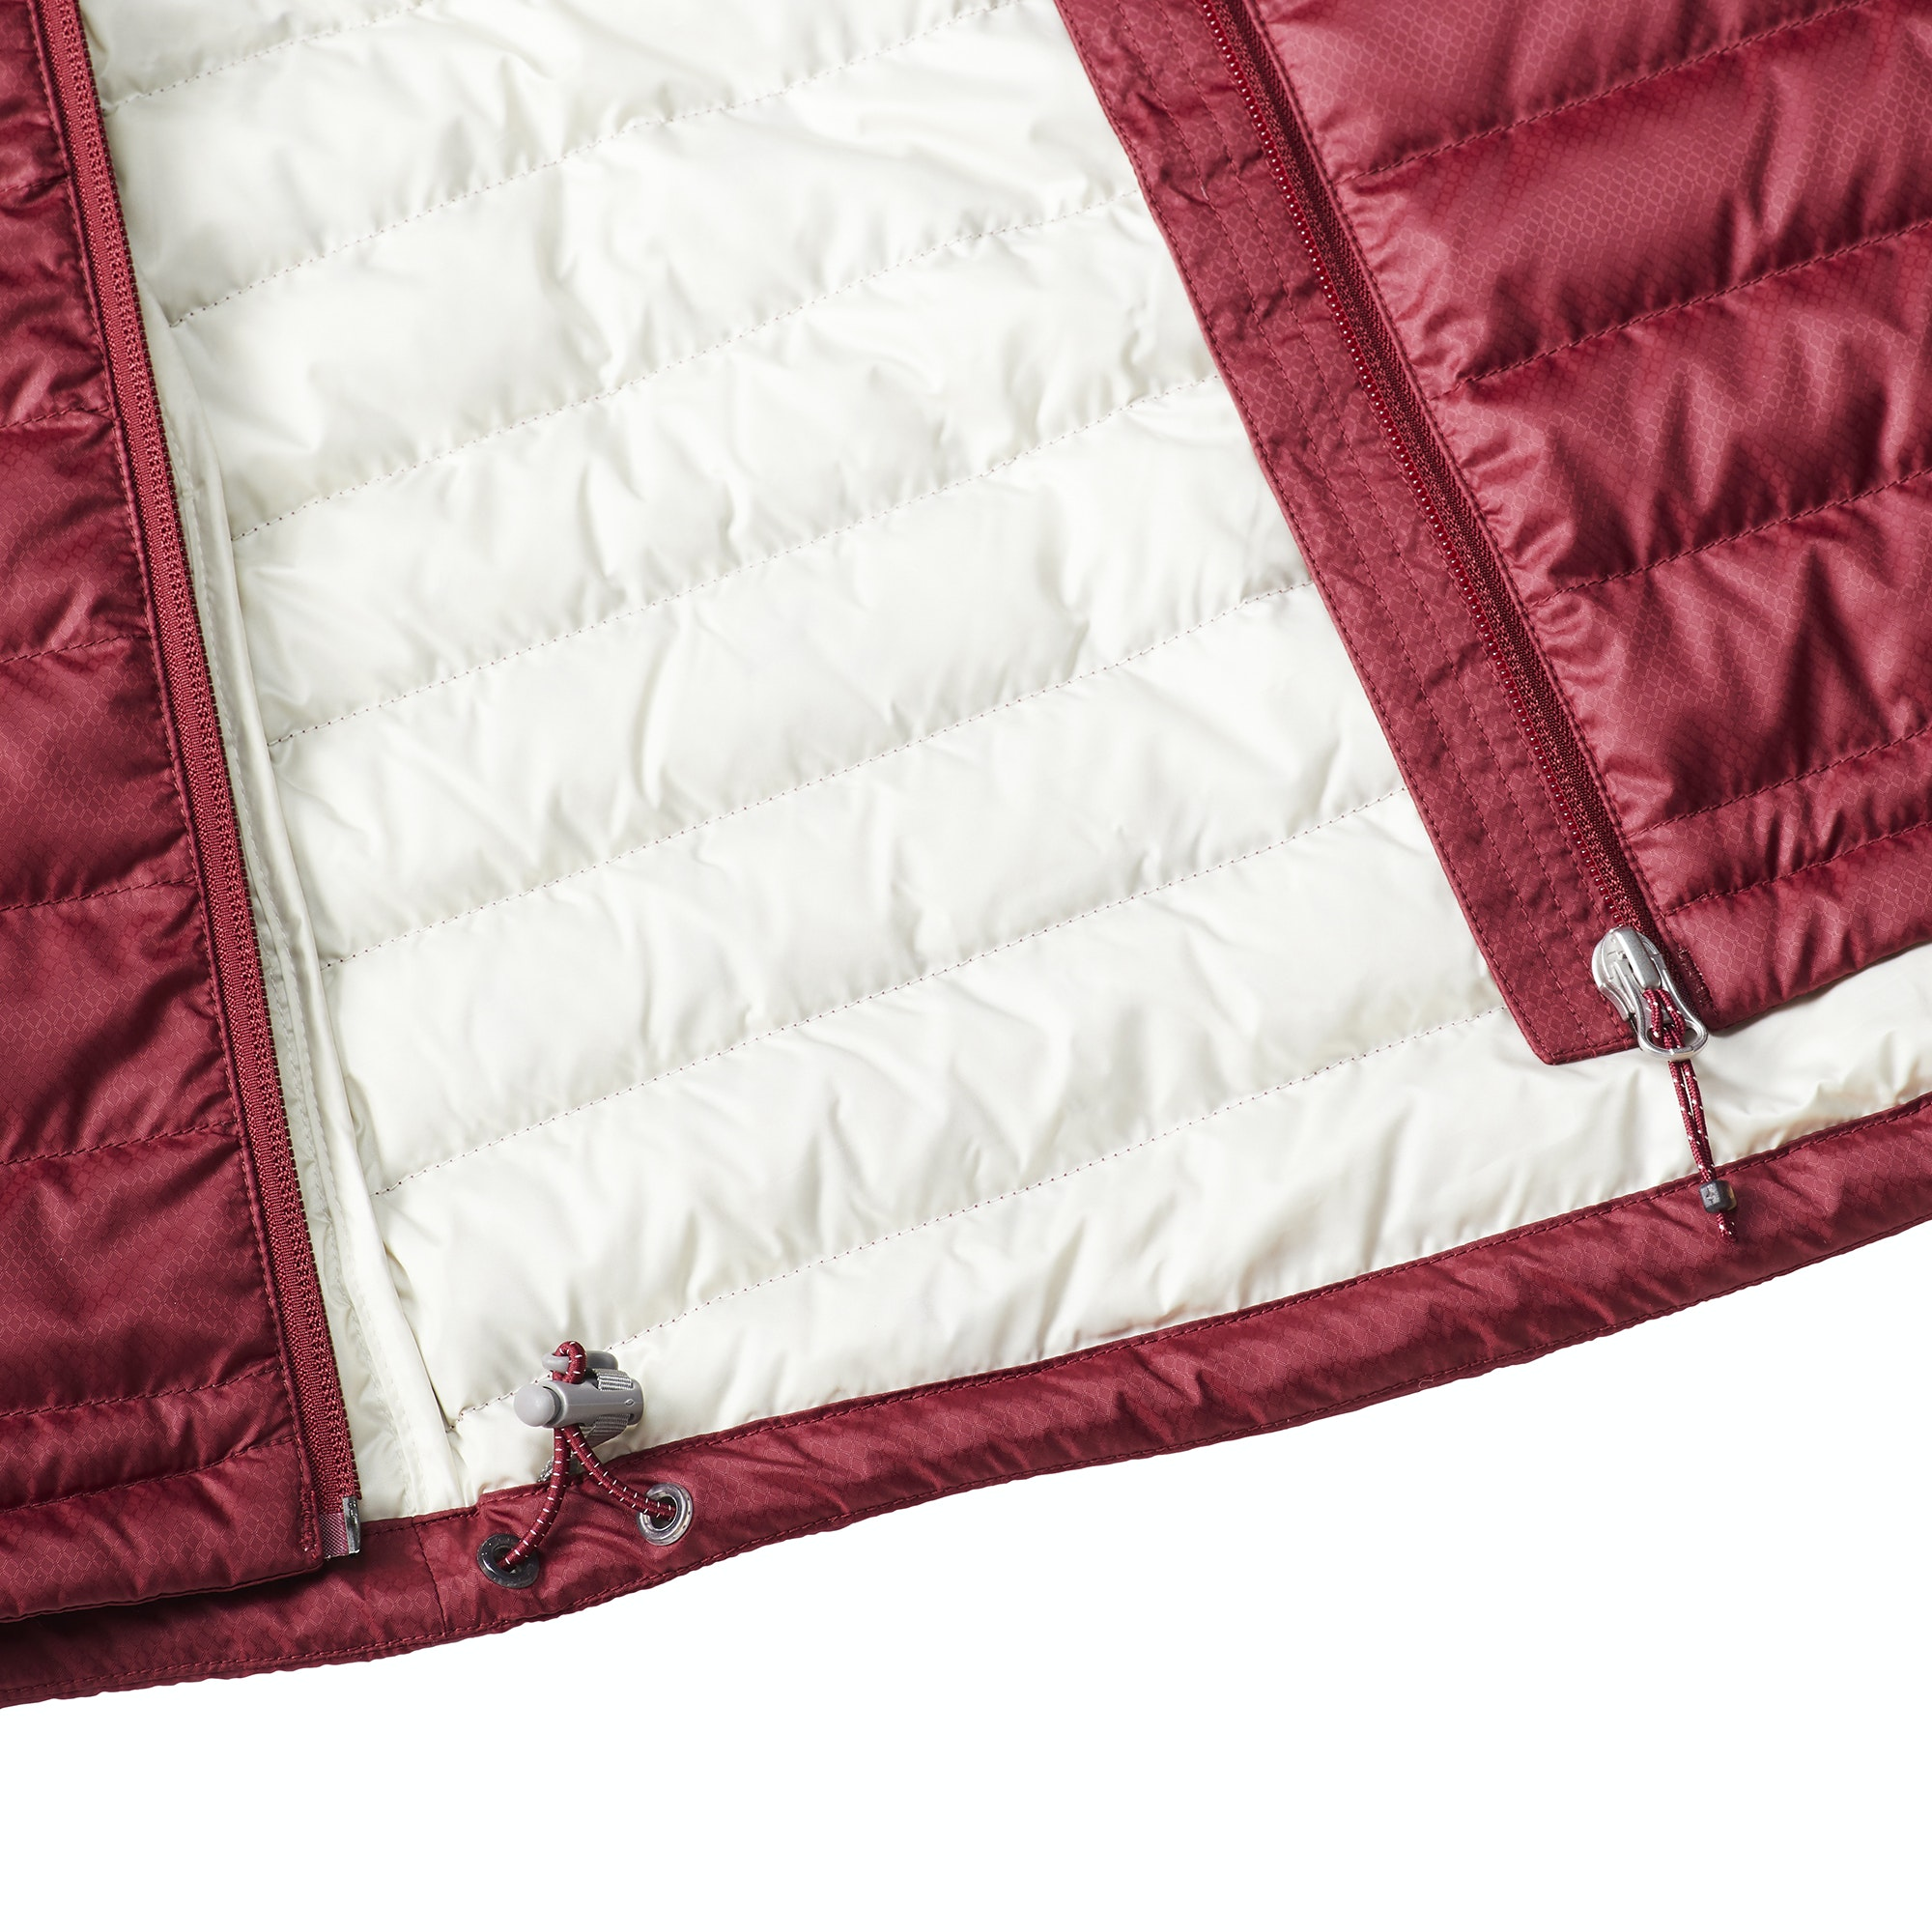 NEW-Kathmandu-Heli-Men-039-s-Lightweight-Duck-Down-Coat-Warm-Puffer-Jacket-v2 thumbnail 18